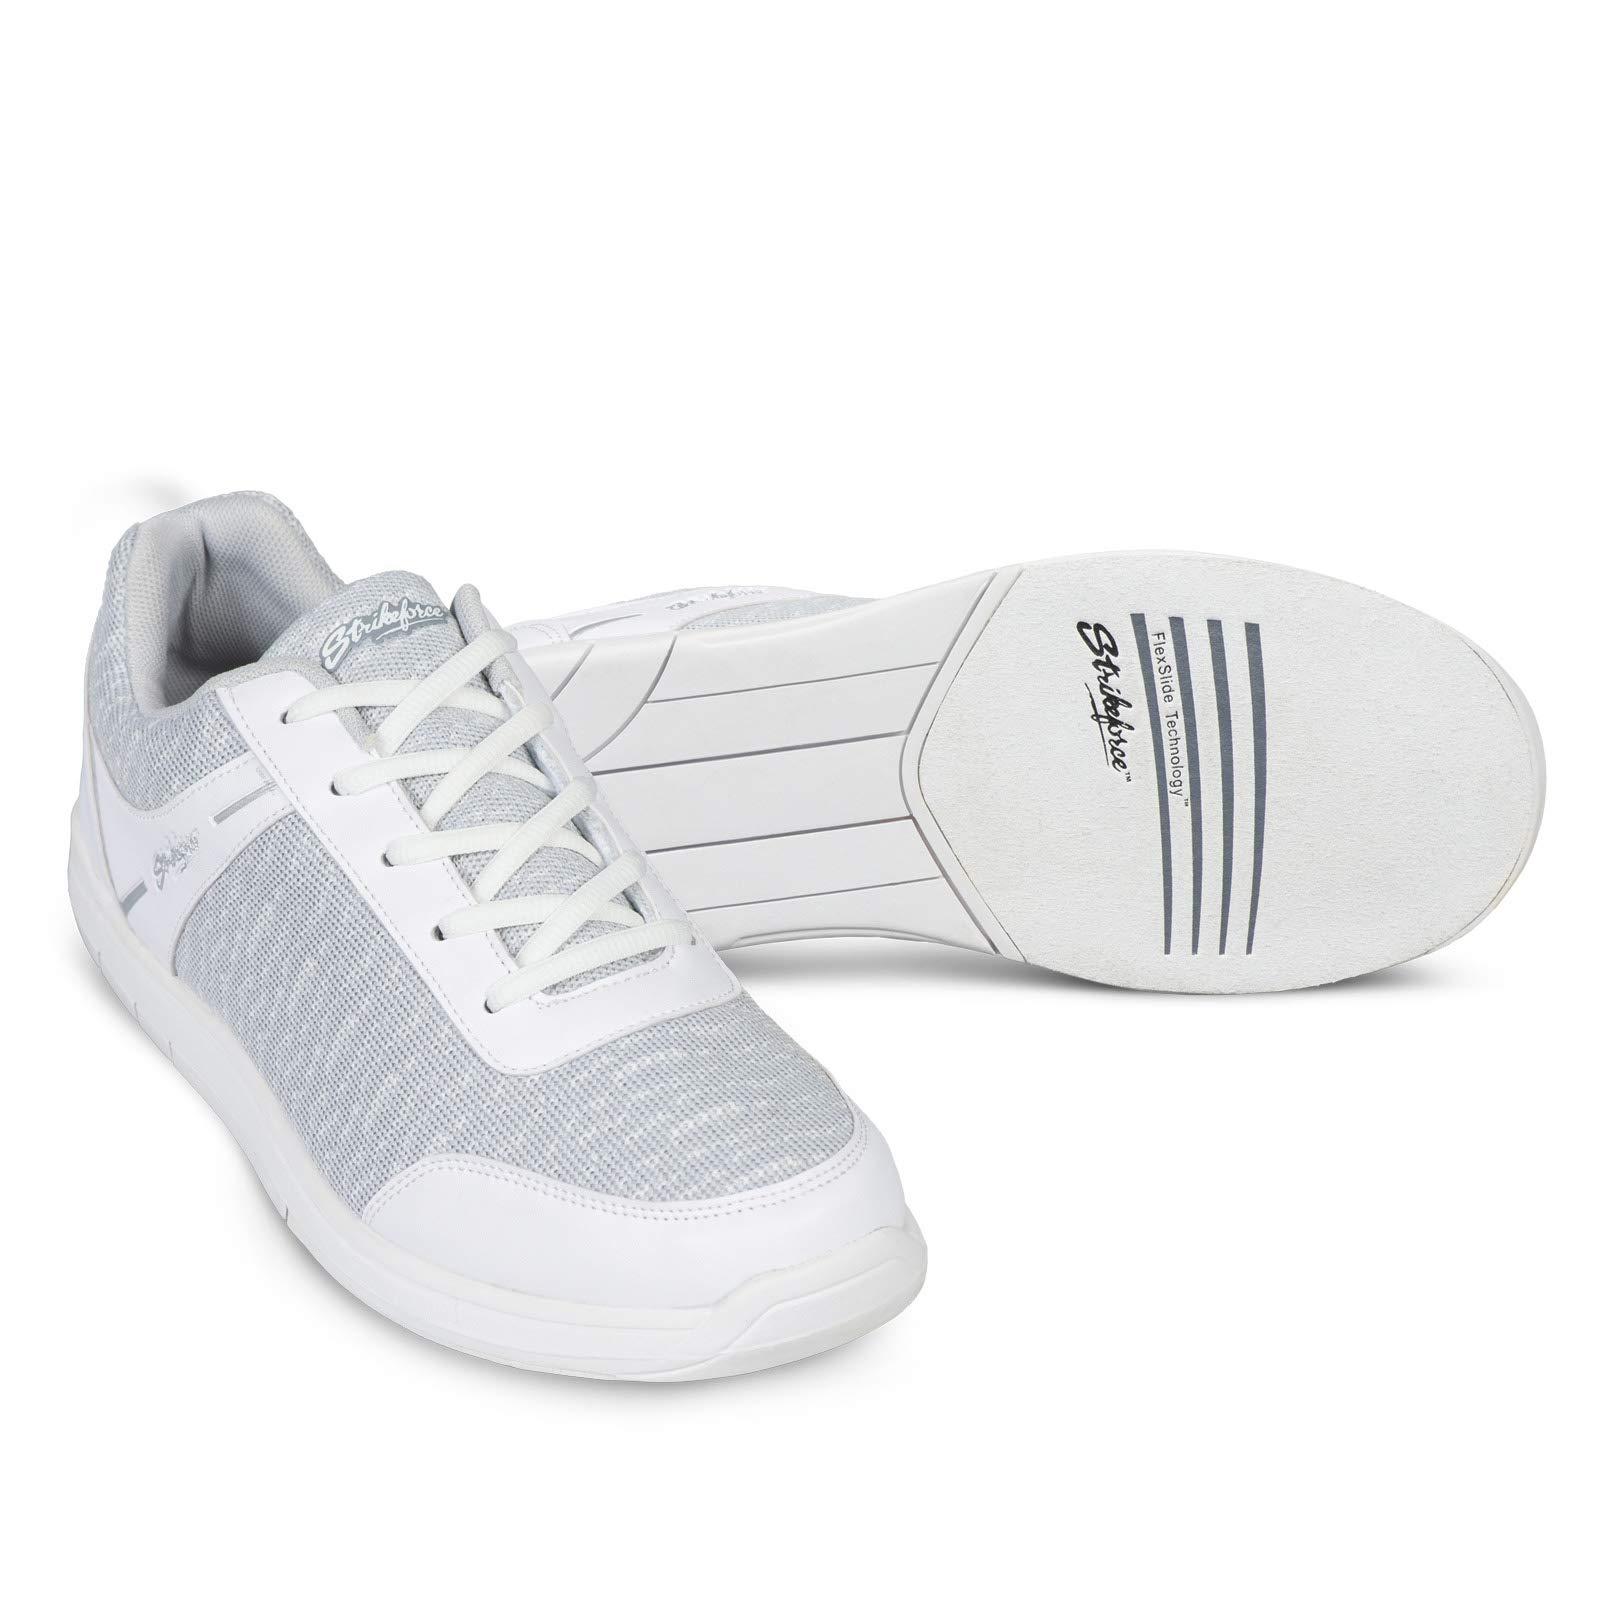 KR Strikeforce Mens Flyer Mesh Bowling Shoes- White/Grey 10